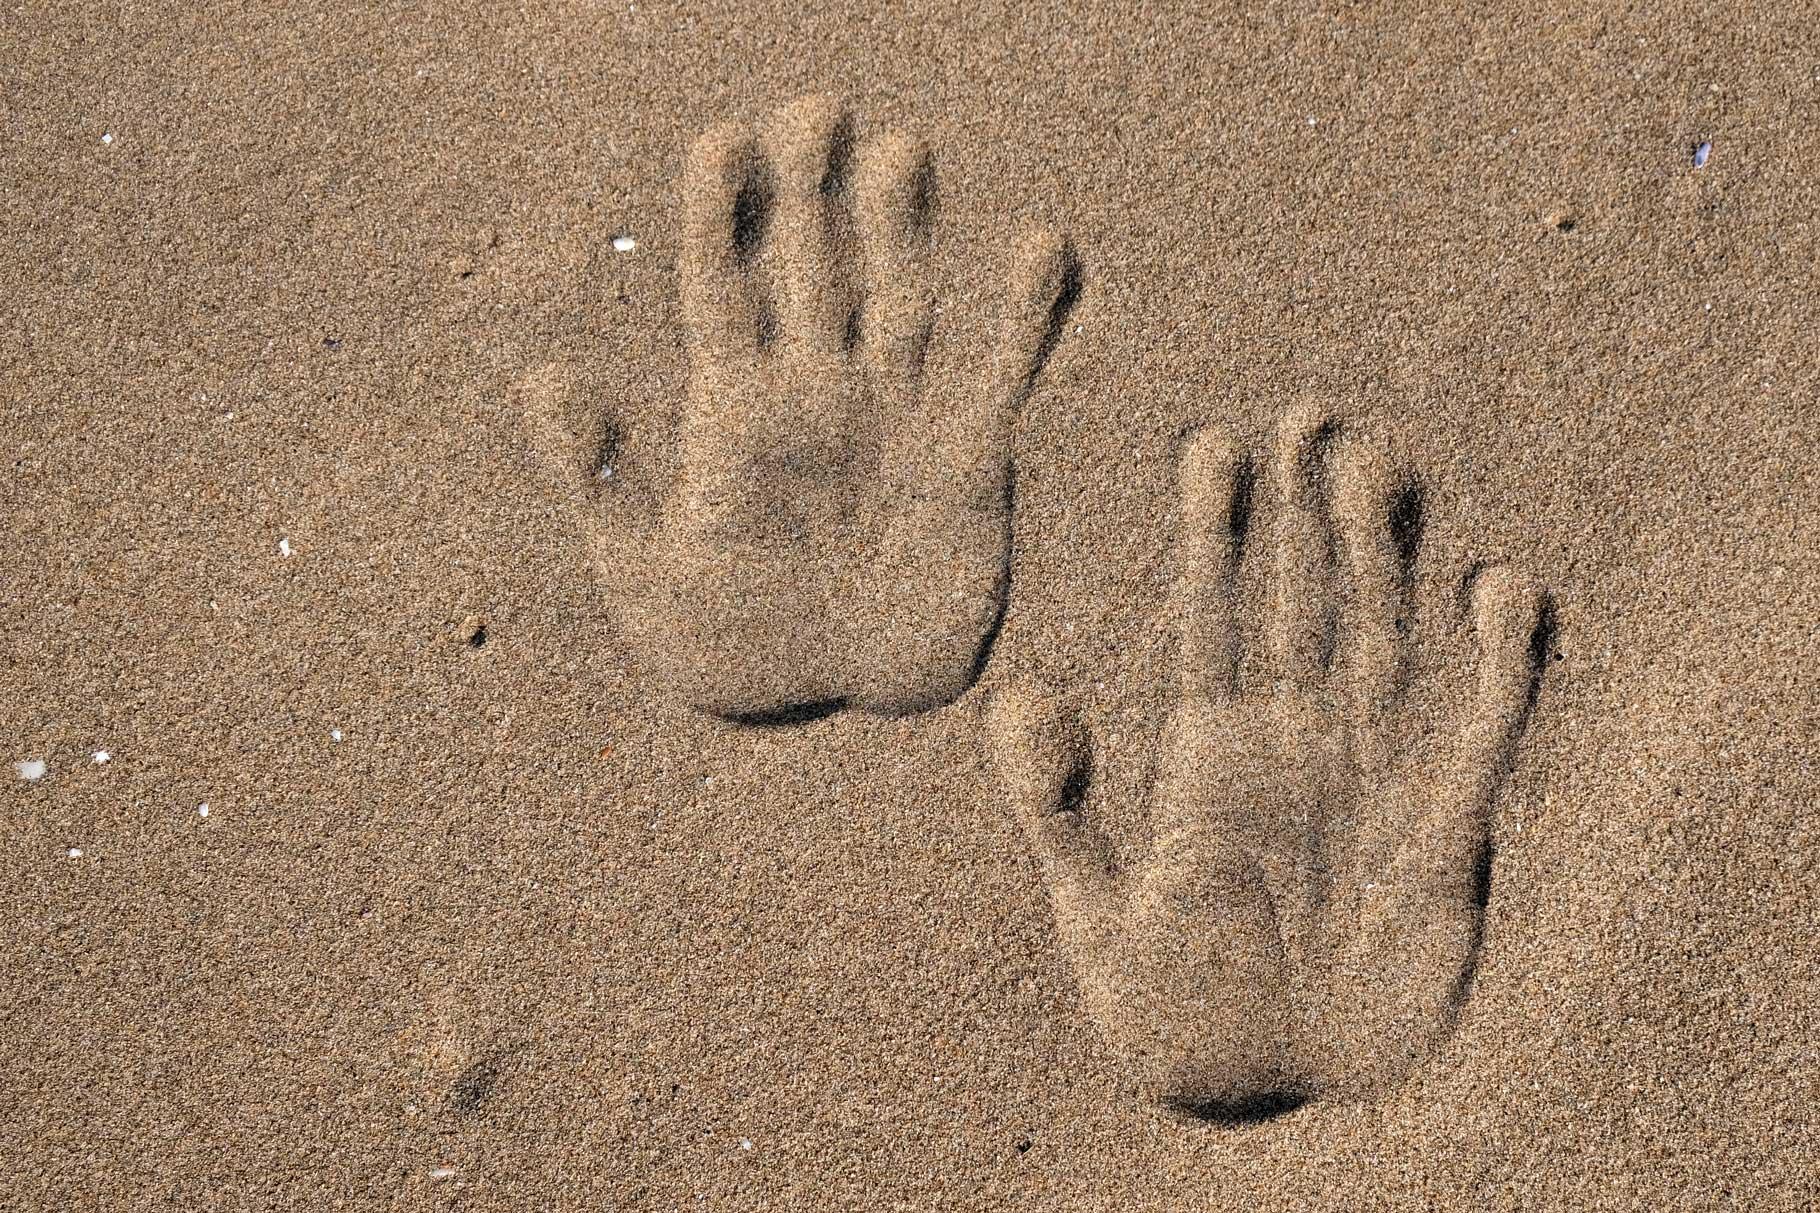 Zwei Handabdrücke im Sand